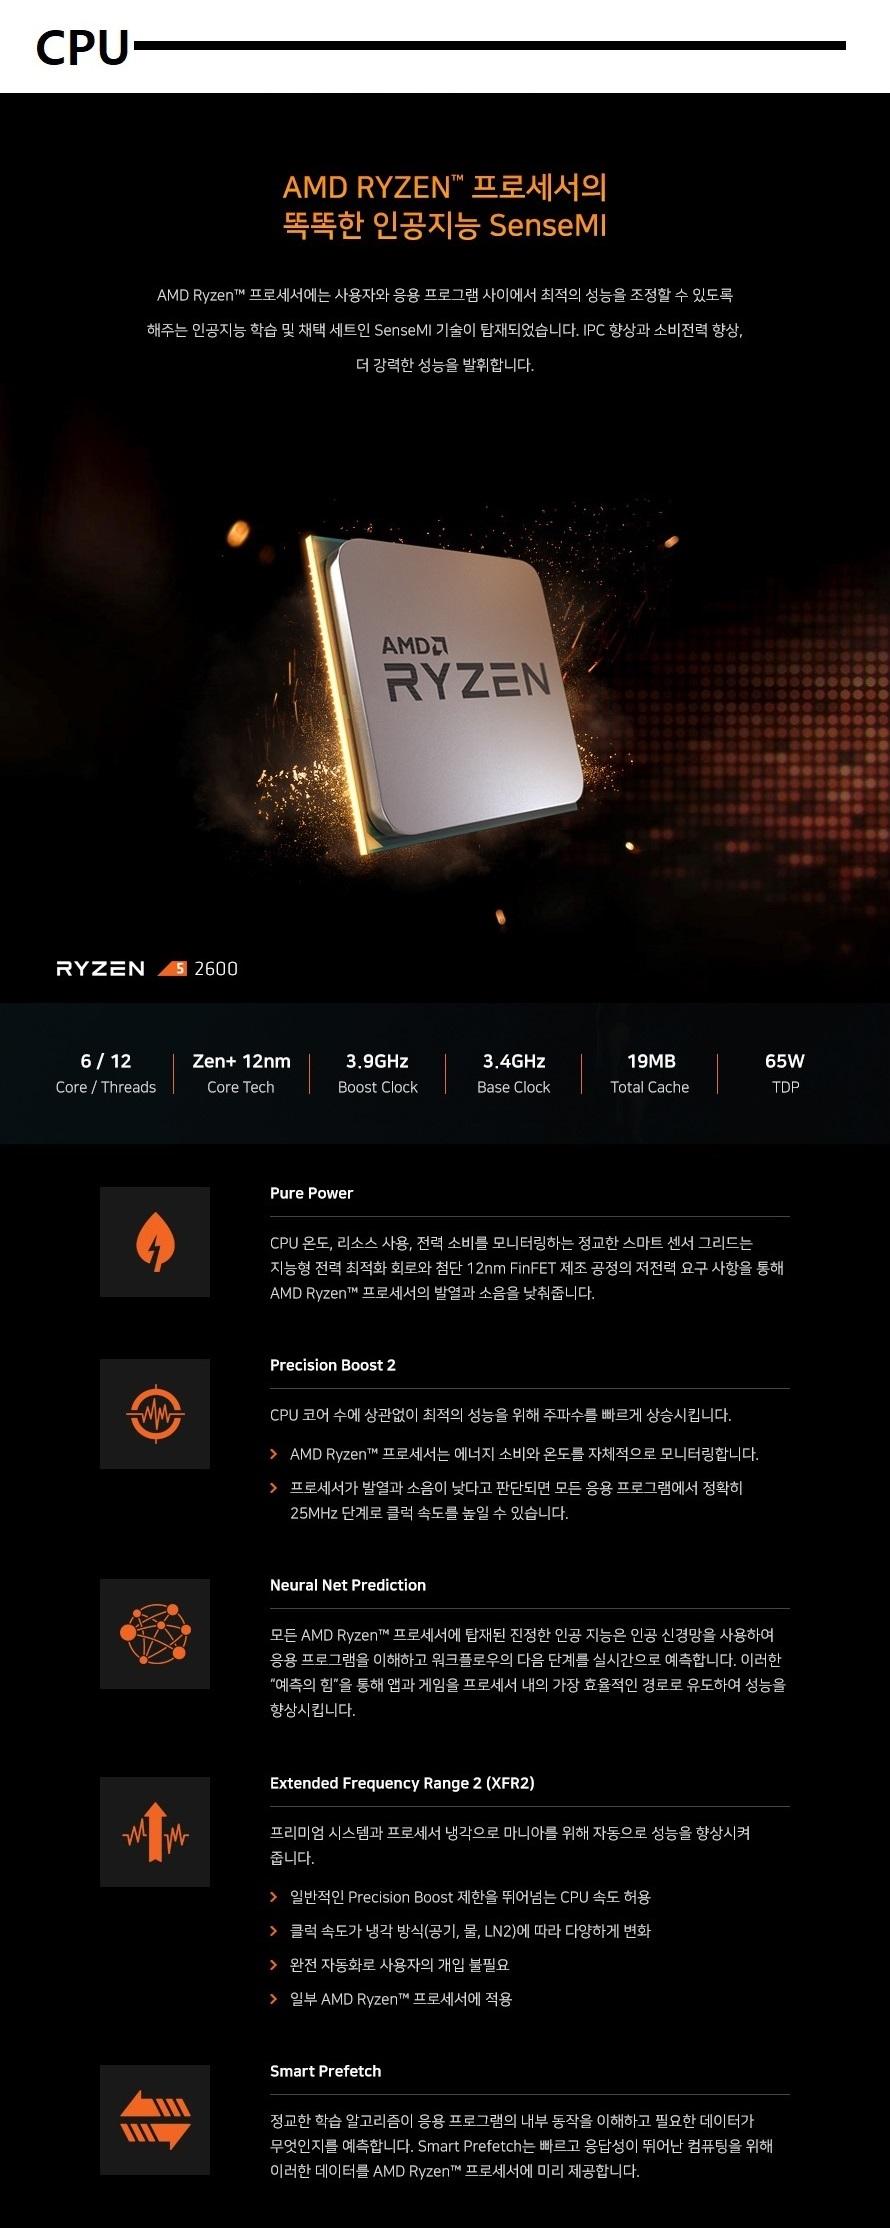 [AMD] 라이젠5 2600 [3.4GHz/6코어12스레드] 터보3.9GHz 정품 + Wraith Stealth 쿨러